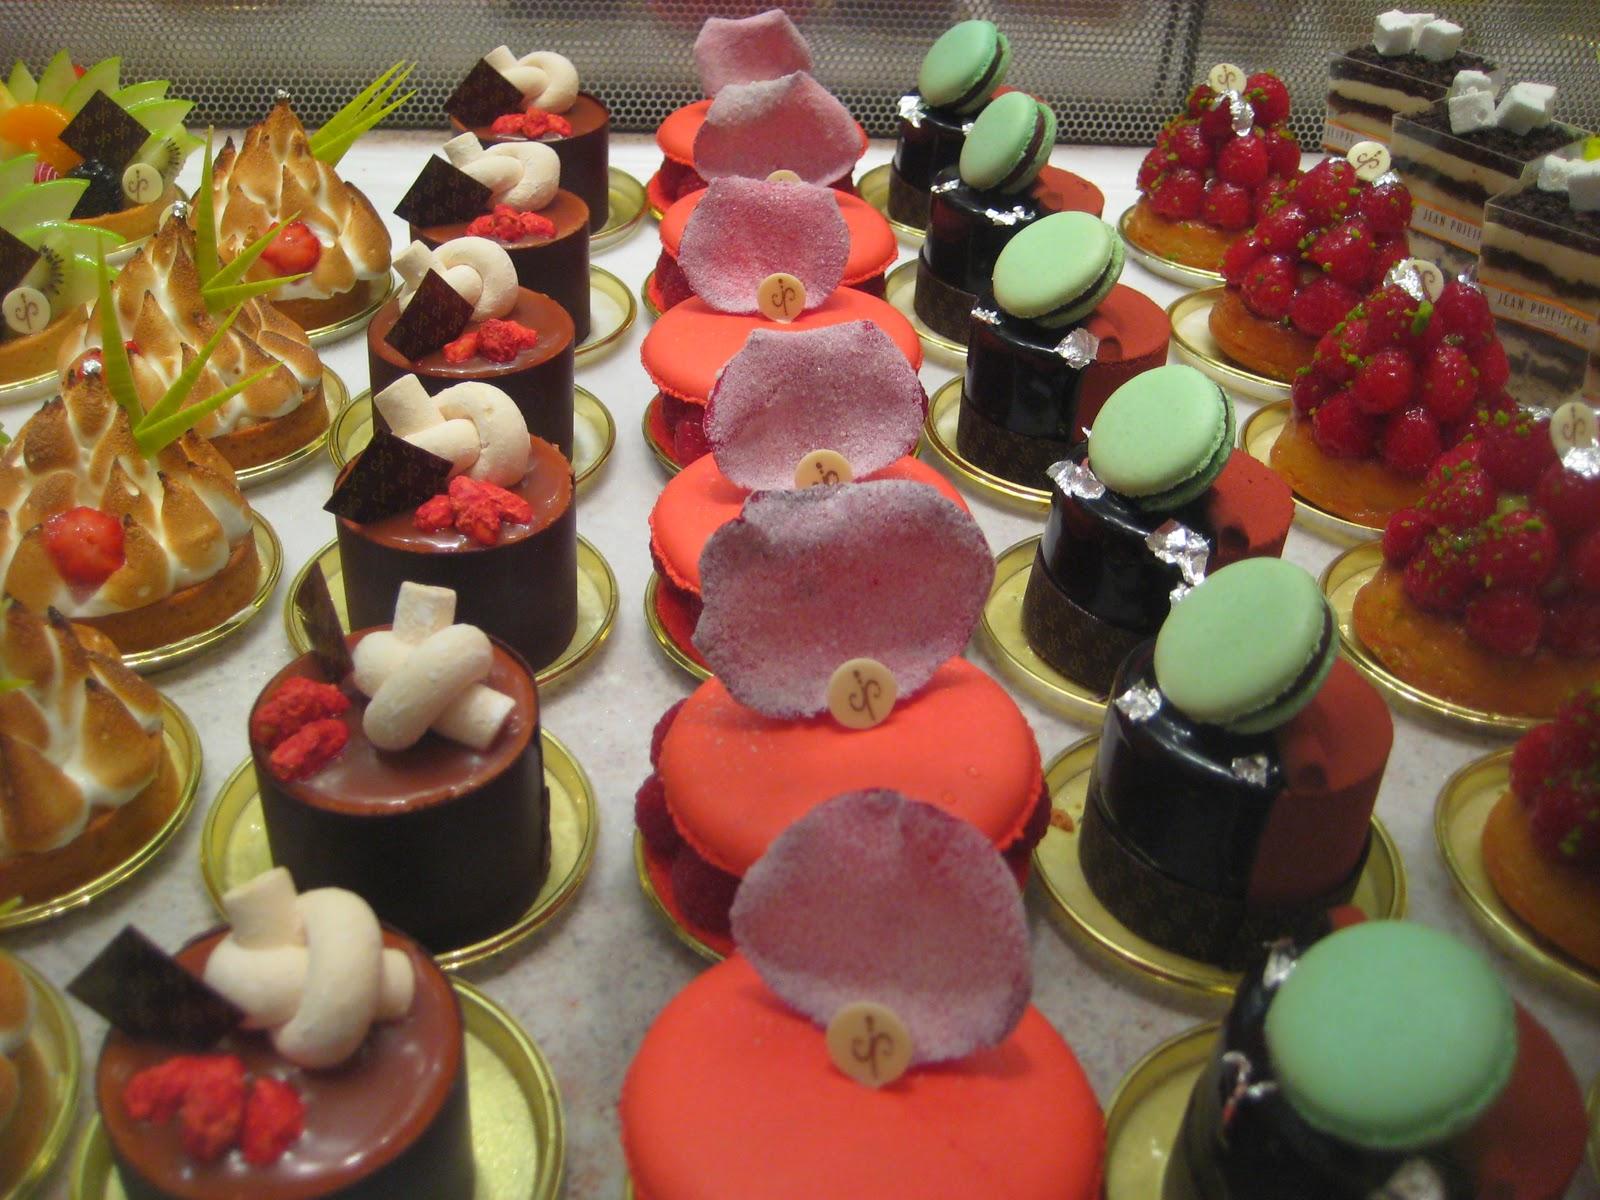 The Ultimate Chocolate Blog: Las Vegas Chocolate Part 1 - Jean Philippe Patisserie